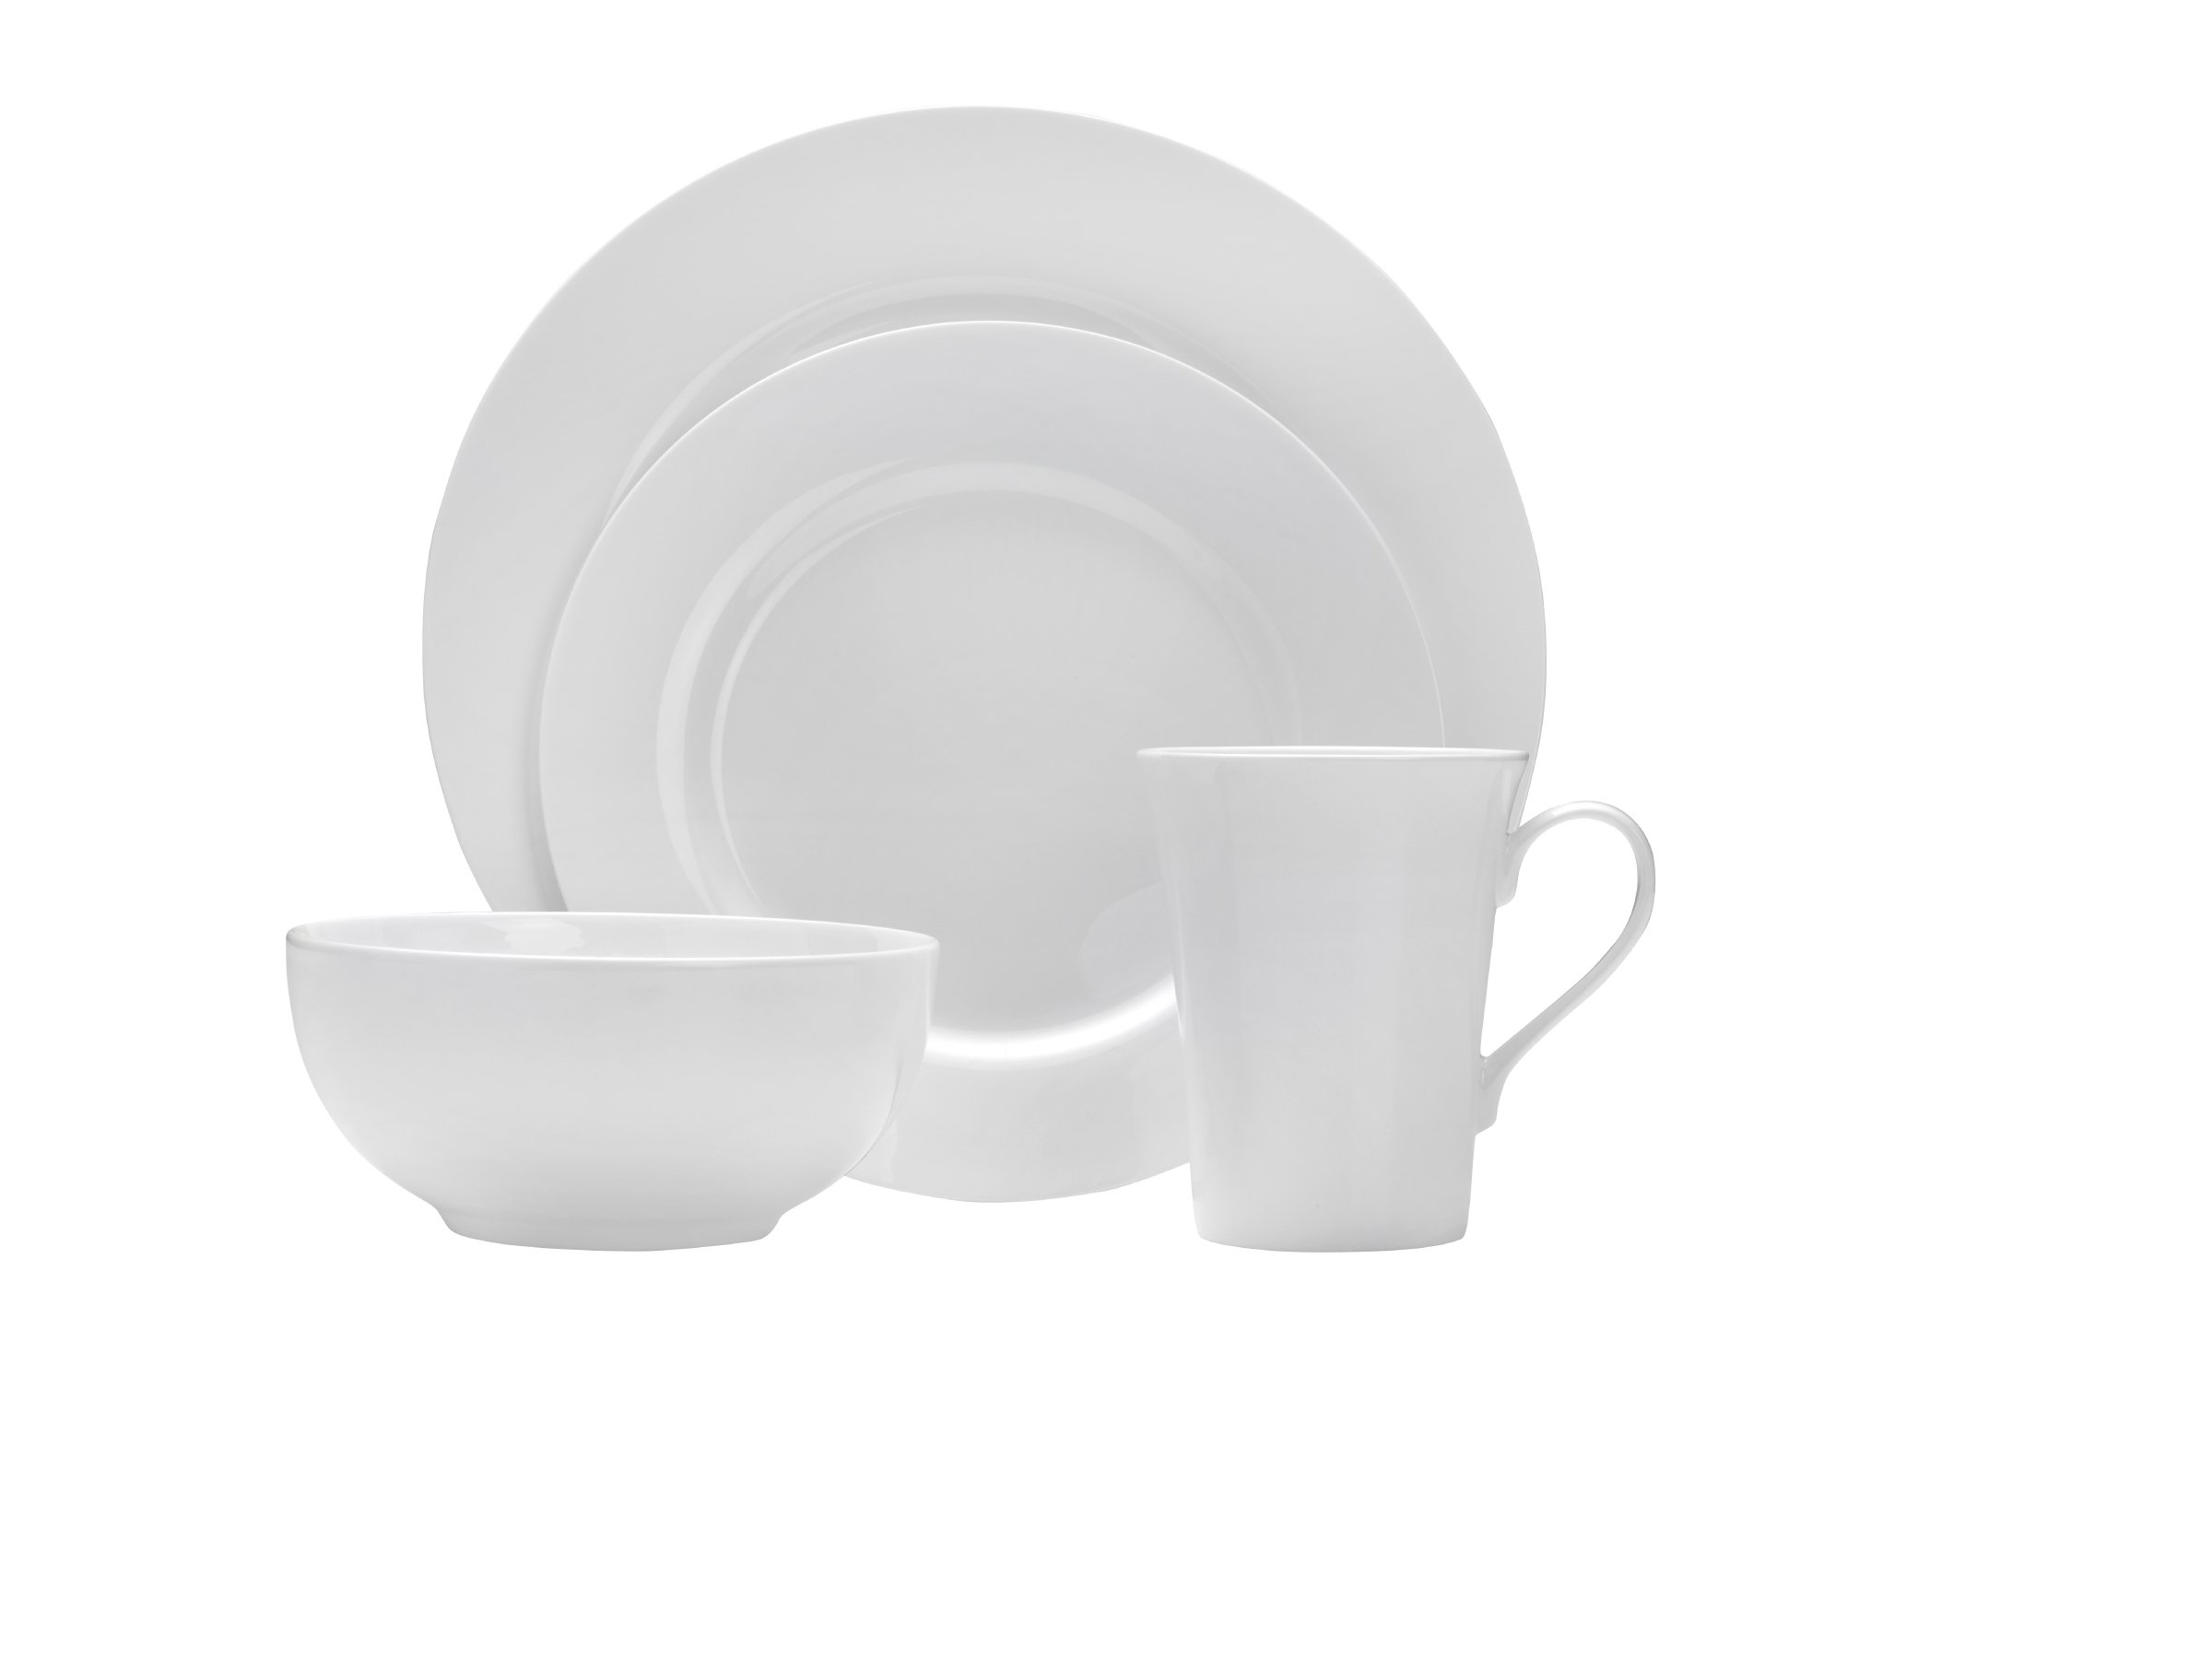 Mikasa Delray 40-Piece Bone China Dinnerware Set, Service for 8 by Mikasa